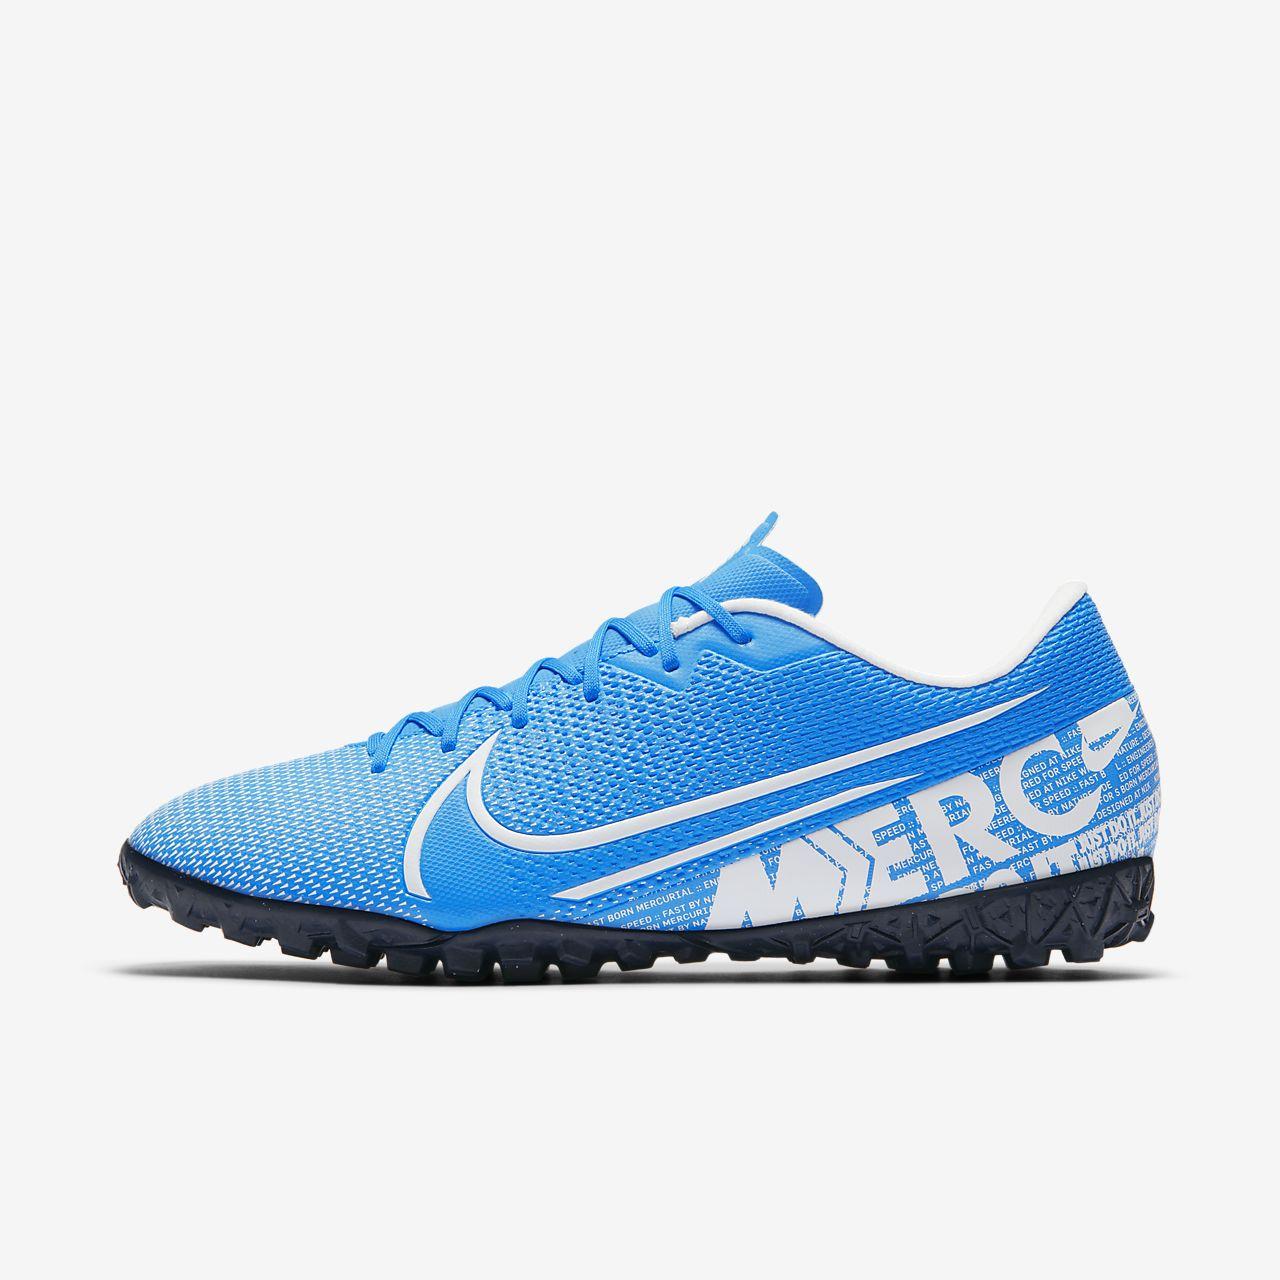 Nike Mercurial Vapor 13 Academy TF-fodboldsko til grus